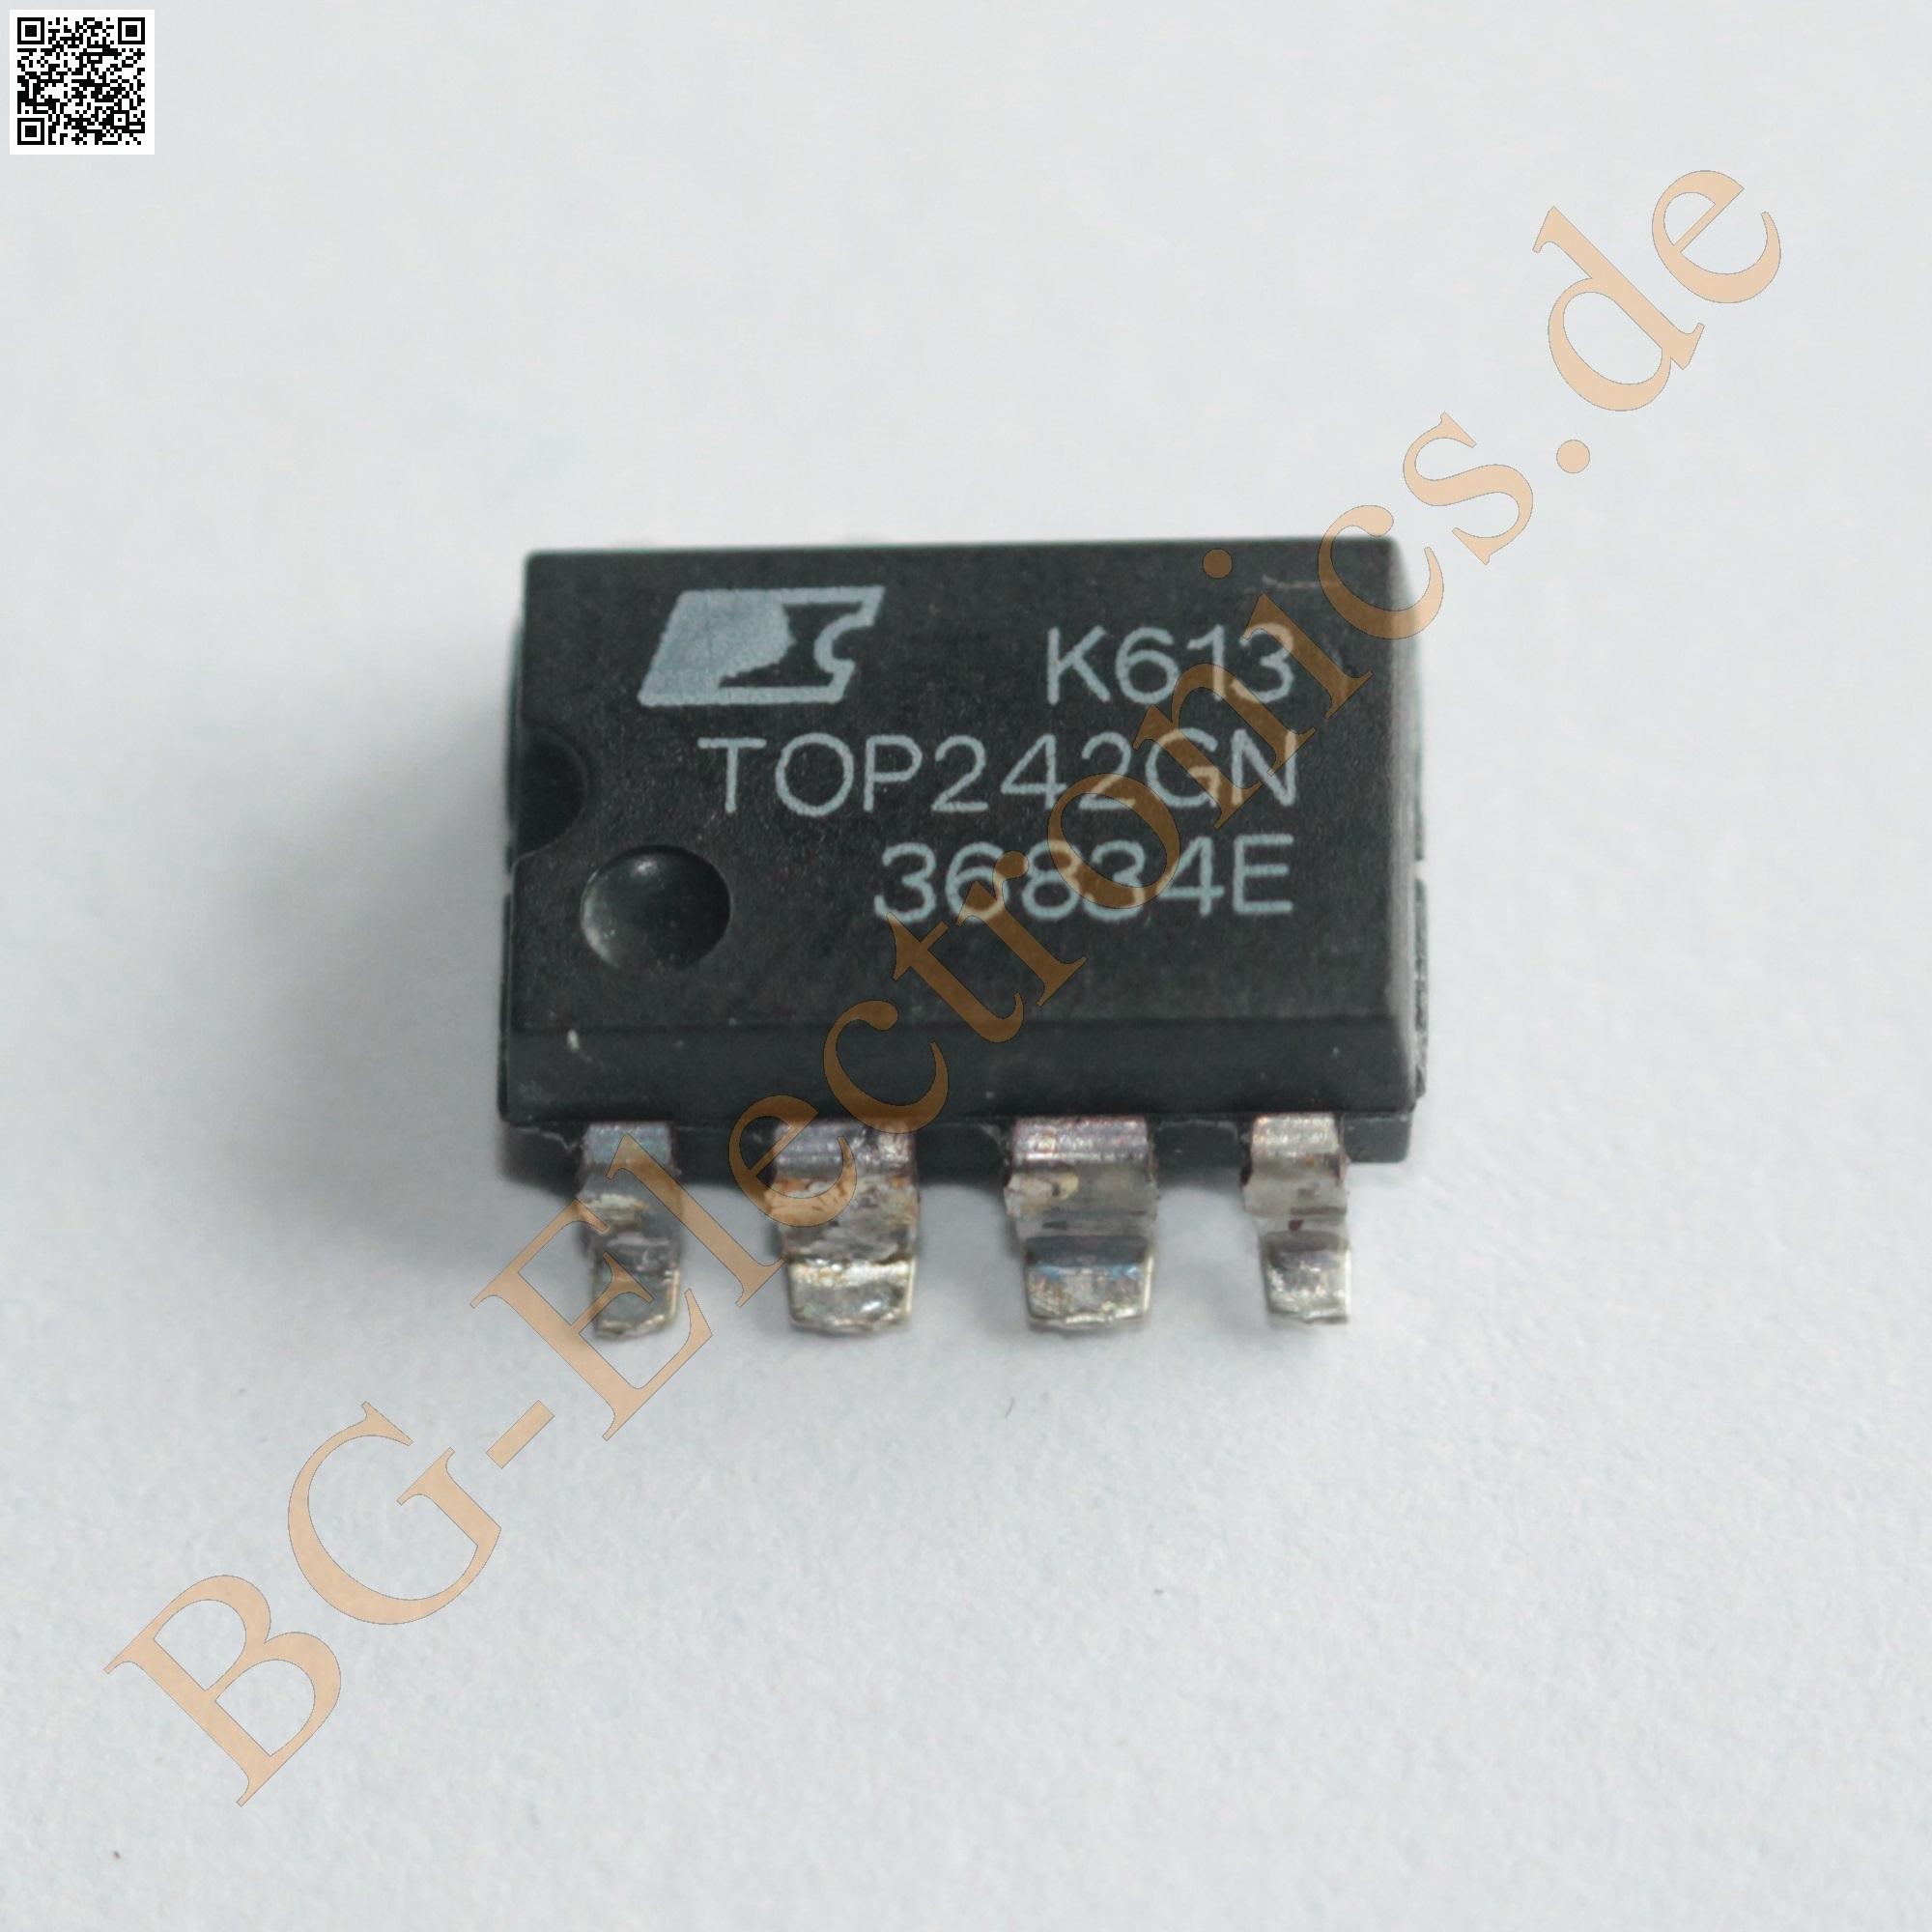 10PCS TOP242 TOP242PN POWER IC OFFLINE SWIT OVP UVLO HV 7DIP NEW